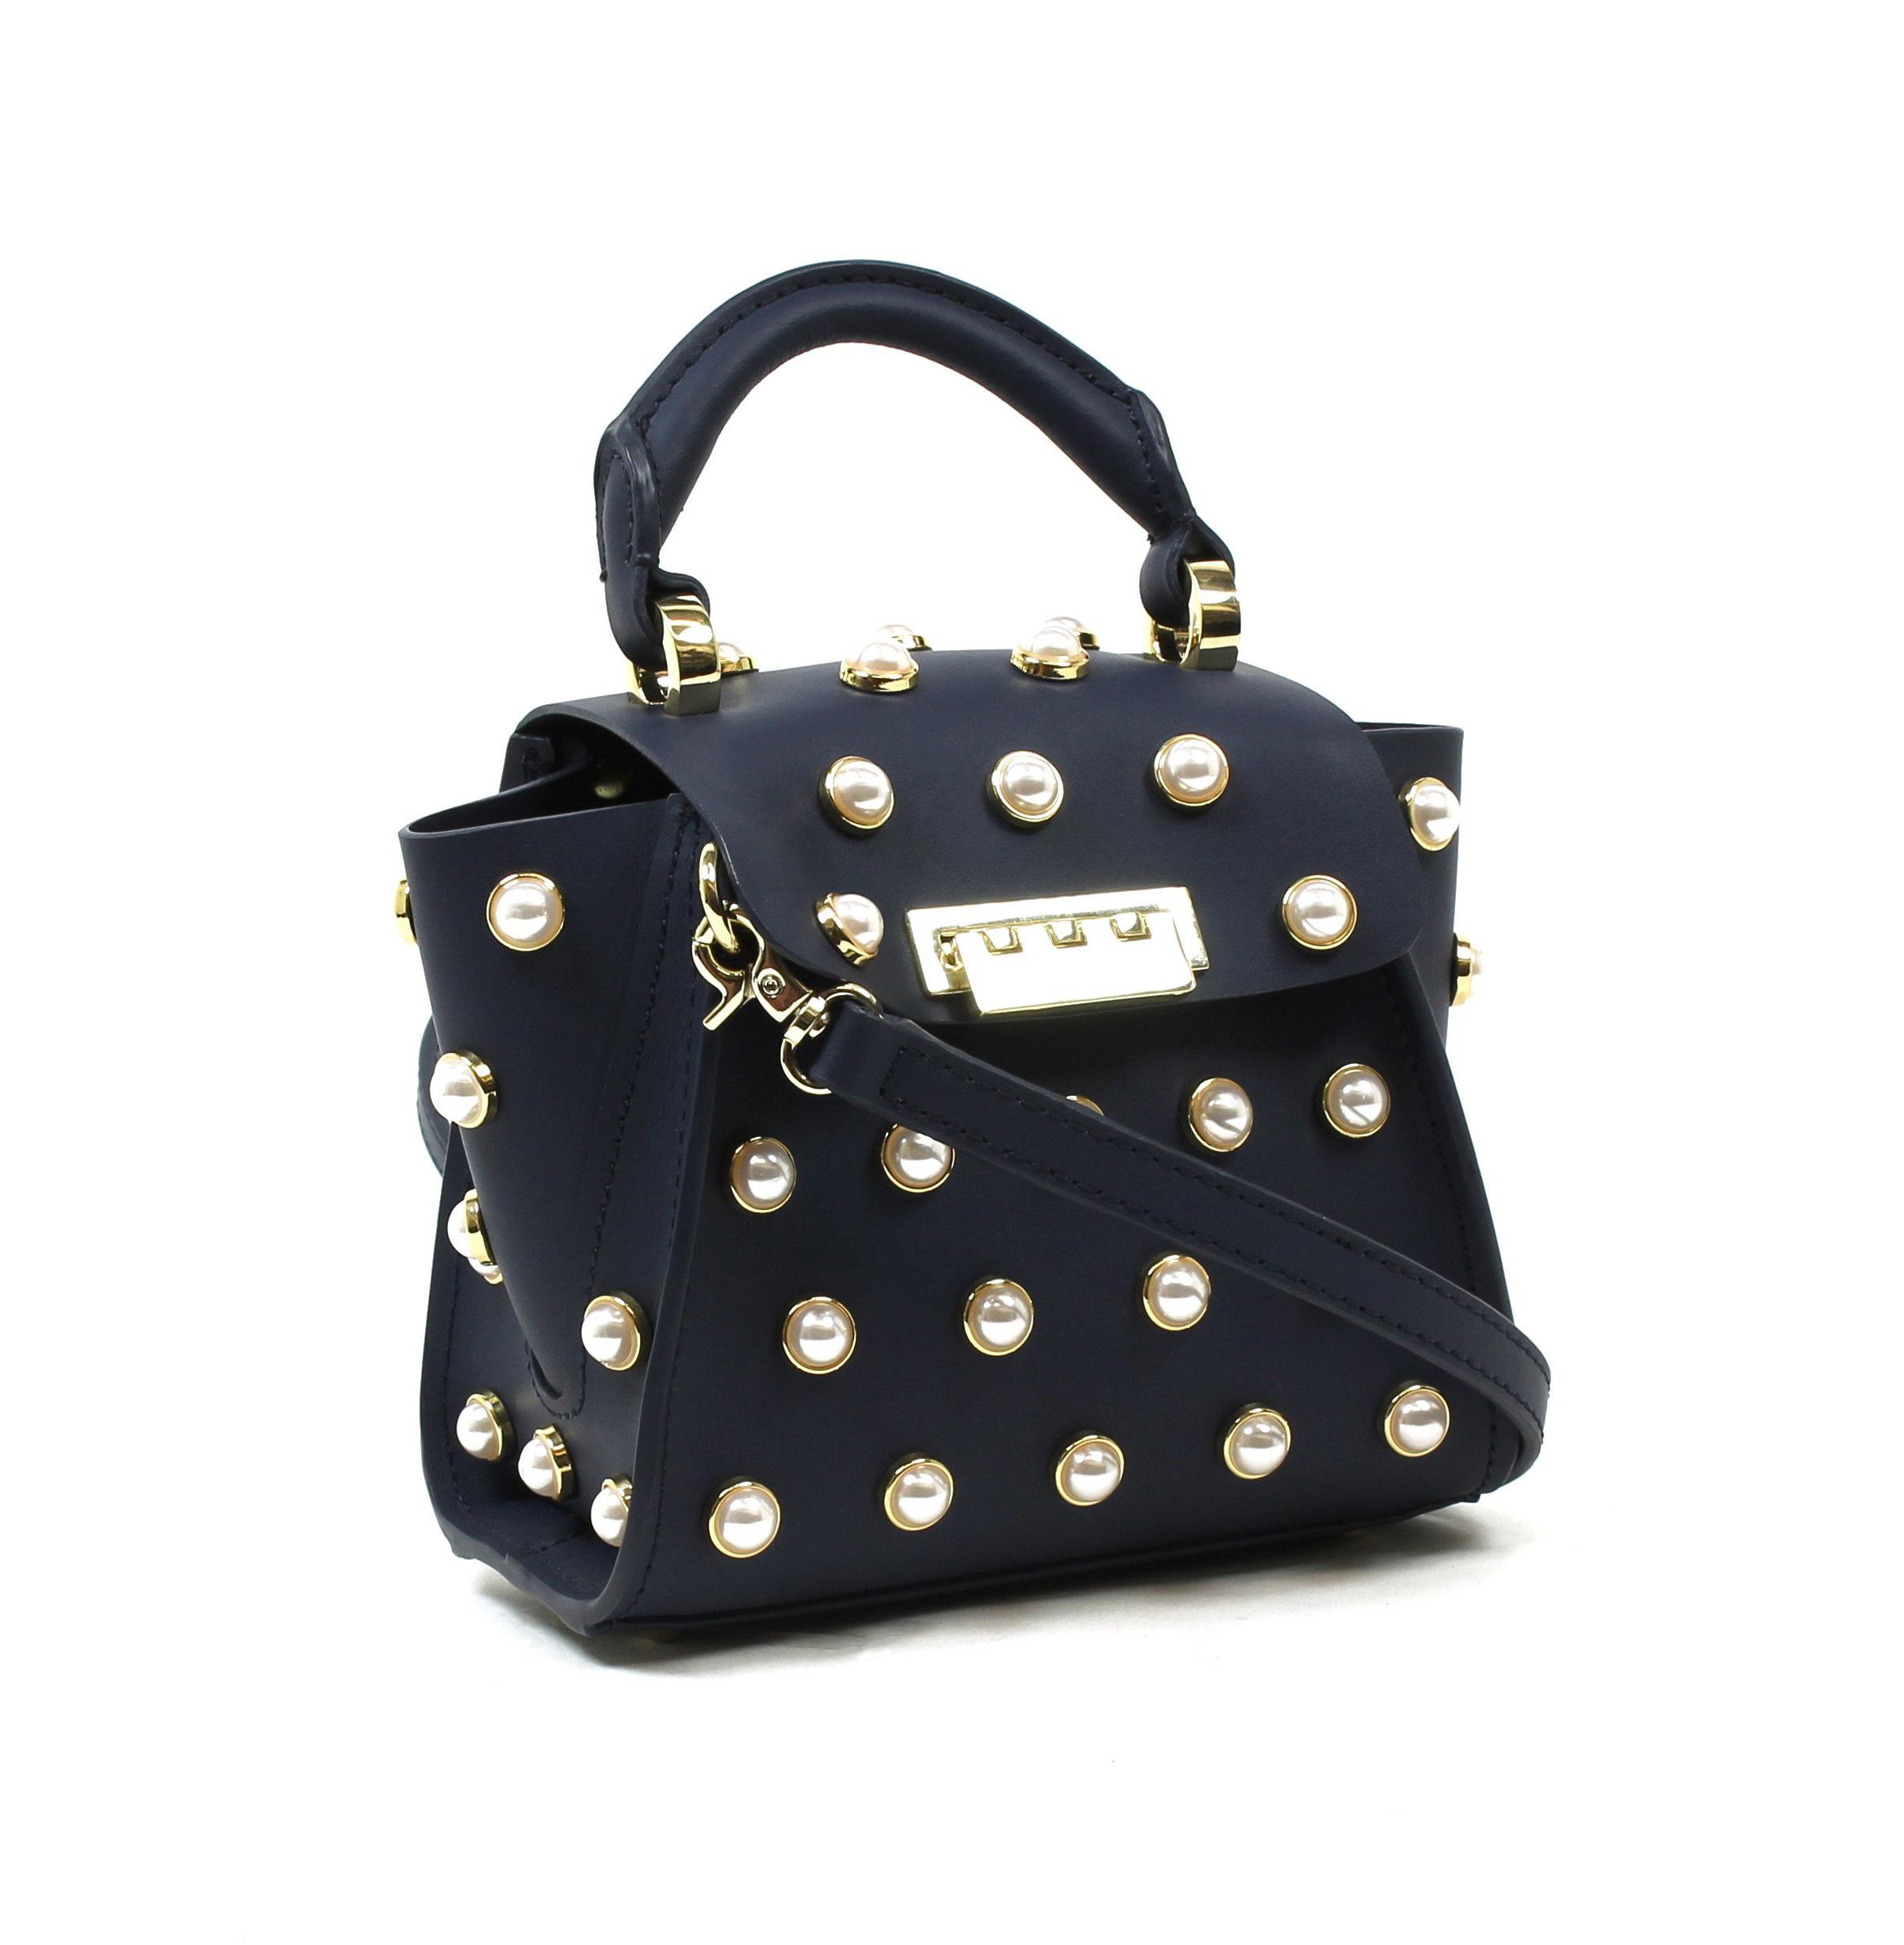 zacposen包 前美國第一夫人都愛的包包